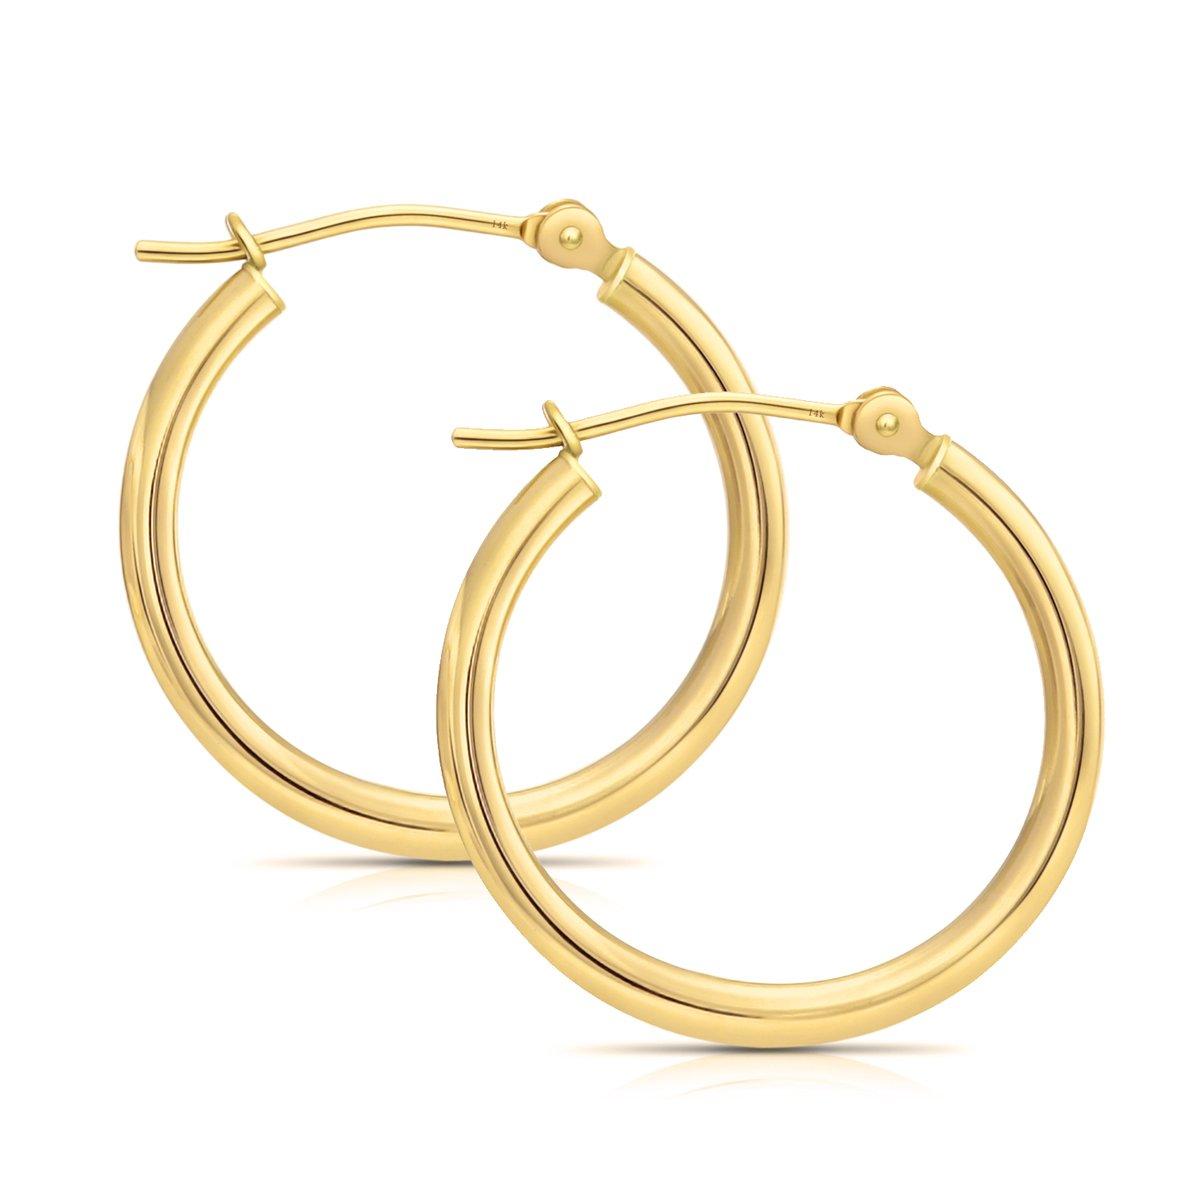 14k Yellow Gold Hoop Earrings, 16mm (0.6'' Diameter) (yellow-gold)